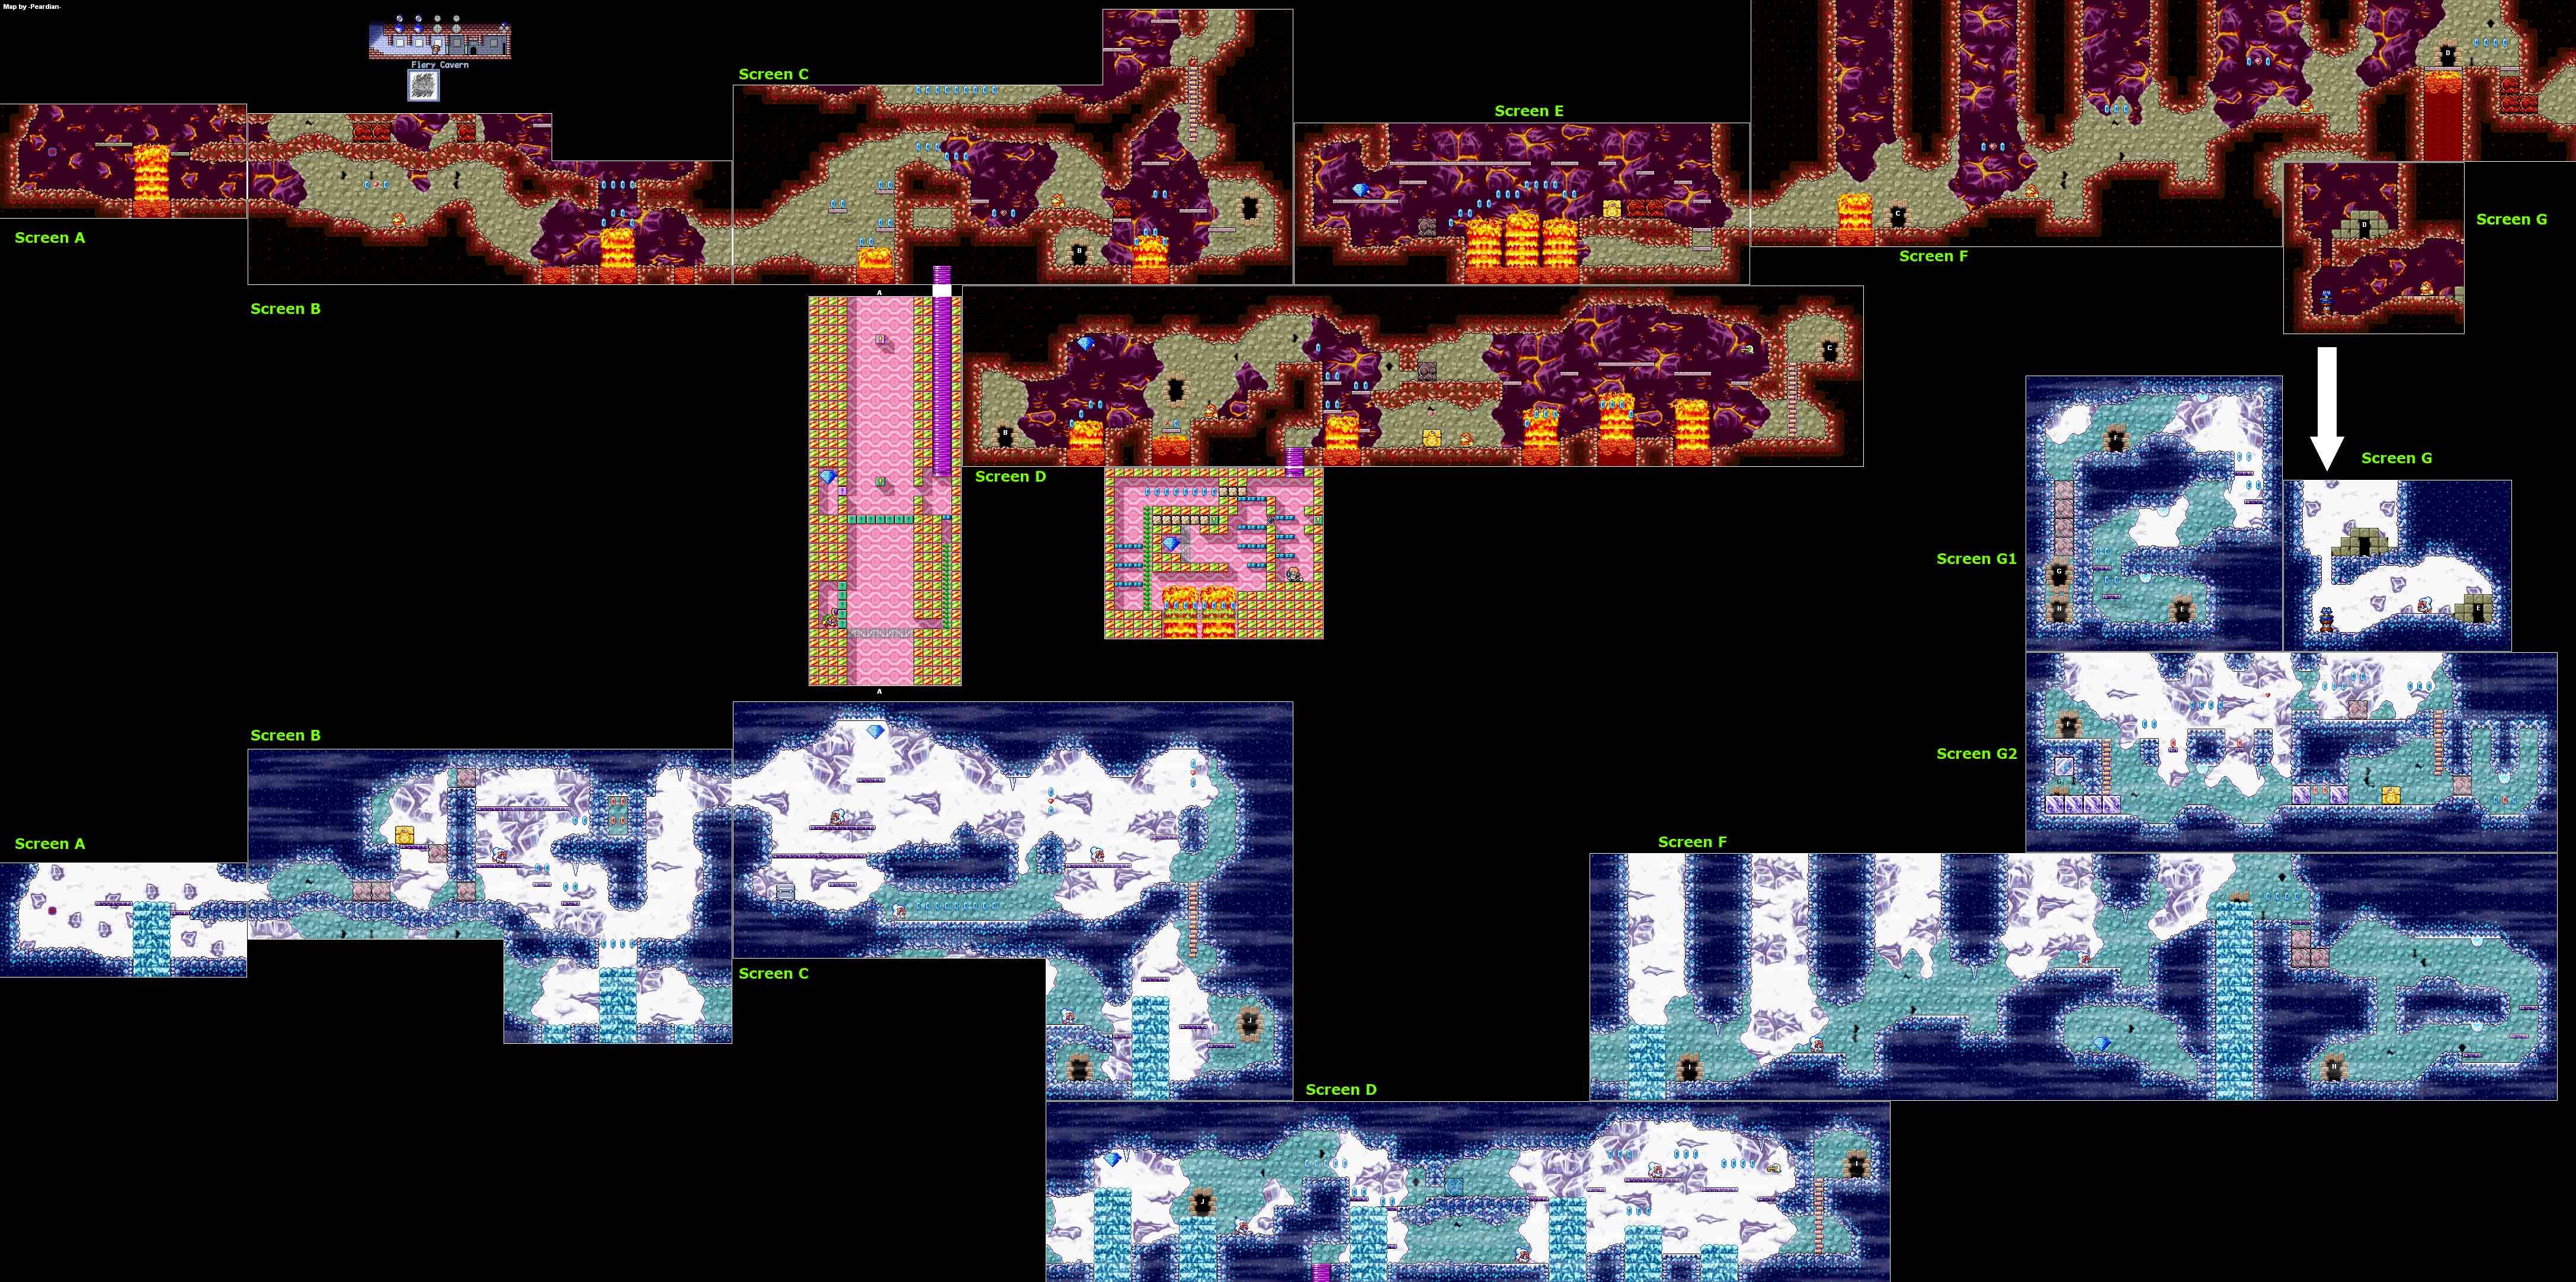 Daniel Primed Hobbyist Game Analysis Sapphire Passage Fiery Cavern